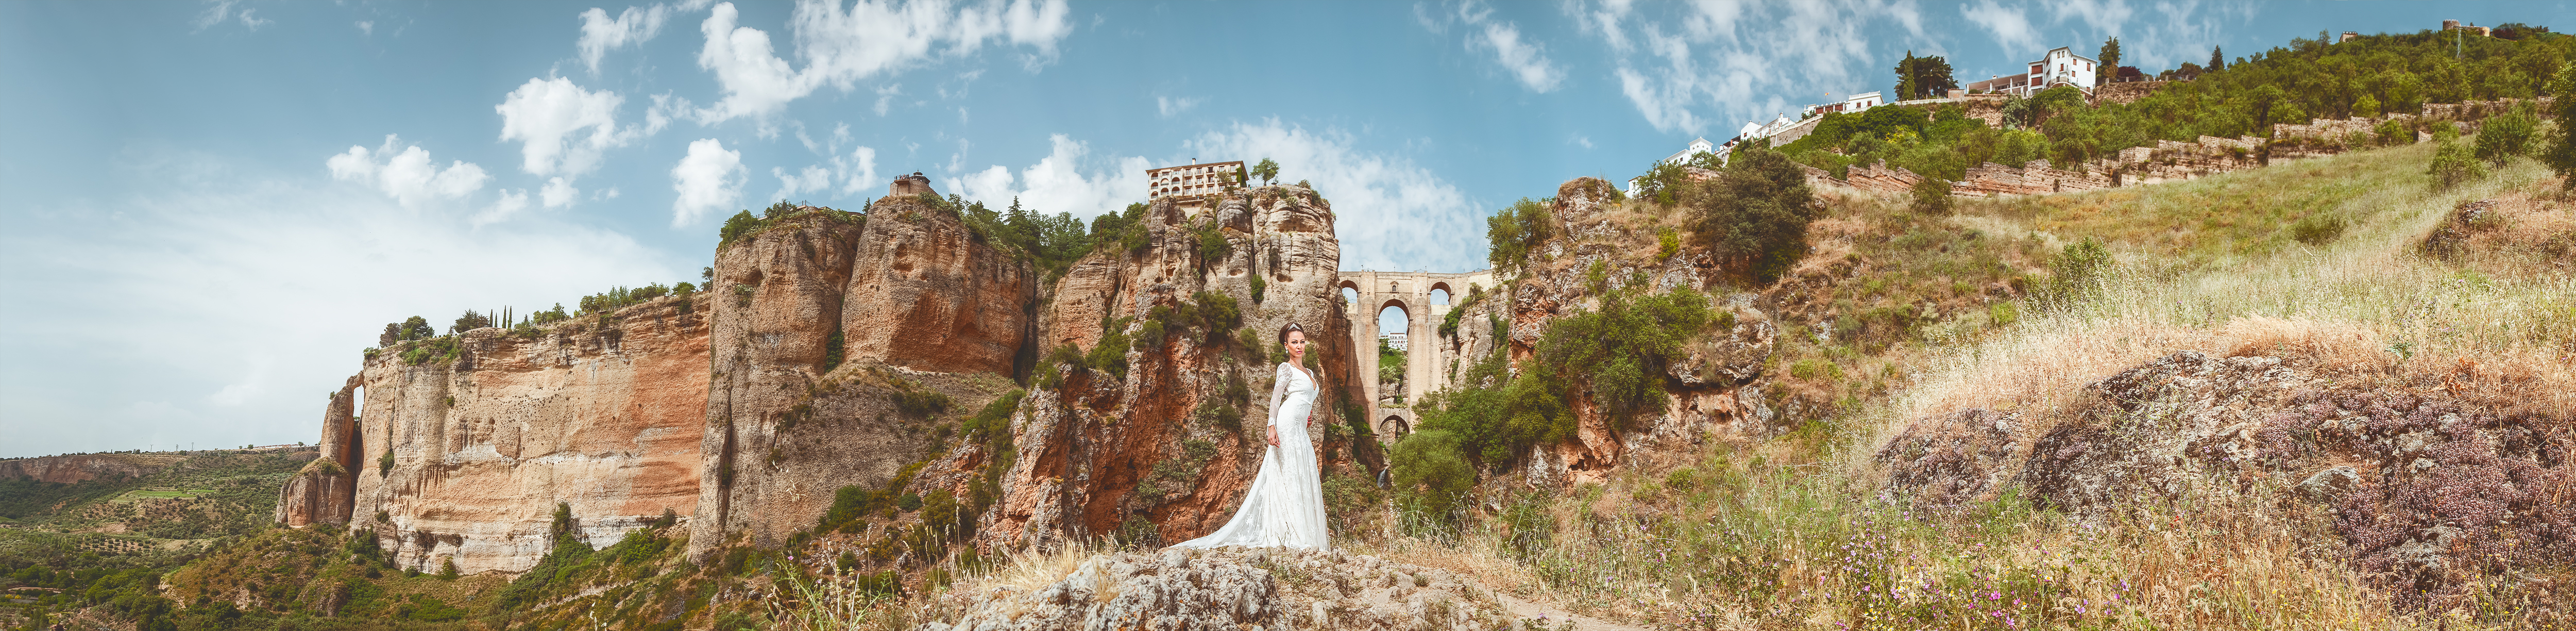 Destination Wedding Photographer Malta Europe Uldis Lapins ULP 564